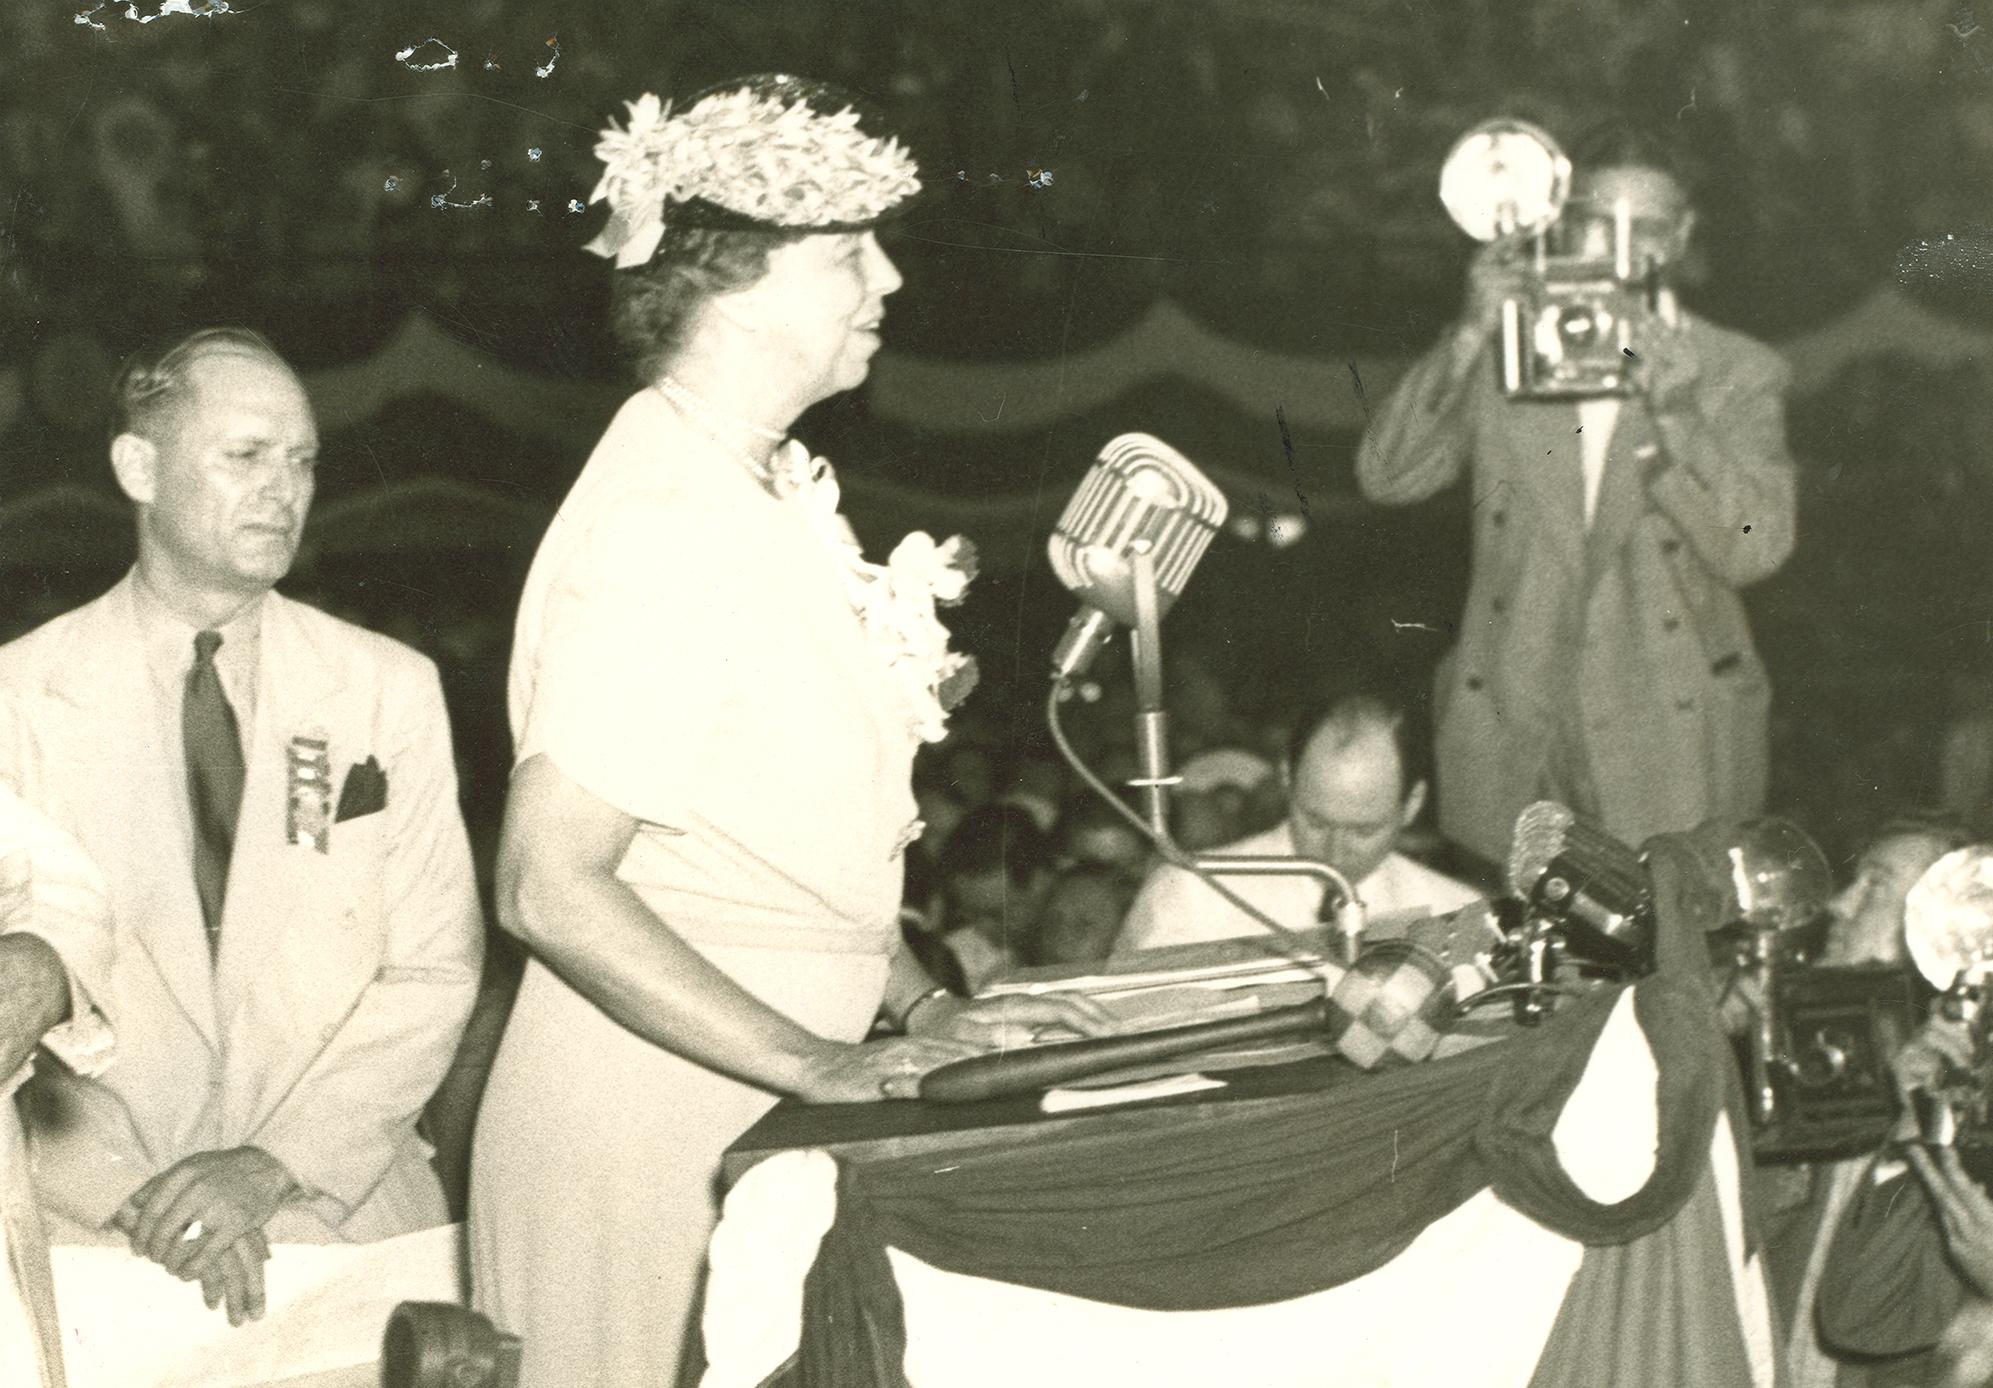 Eleanor_Roosevelt_addresses_Democratic_National_Convention,_Chicago,_Illinois._July_18,_1940